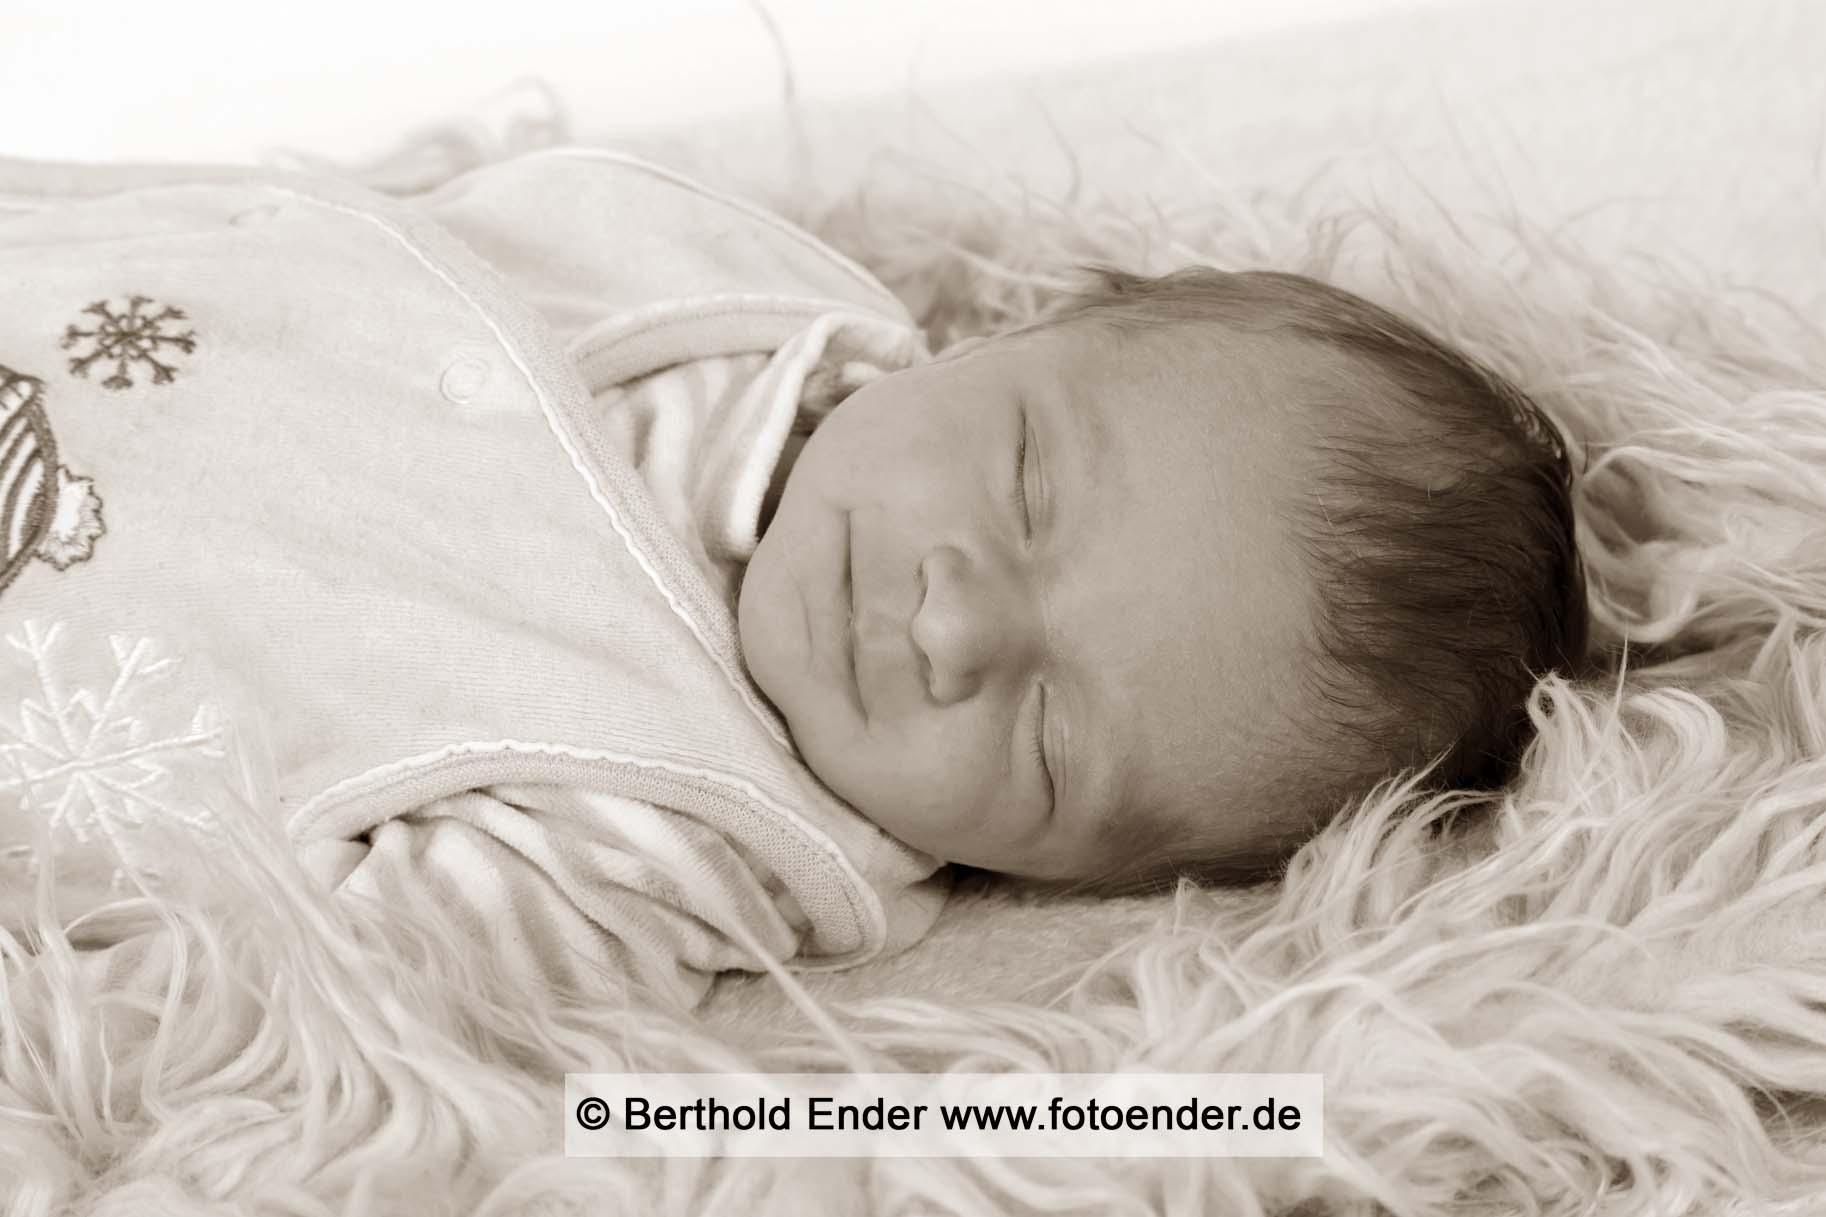 Babybilder im Studio: Fotostudio Ender, Oranienbaum-Wörlitz